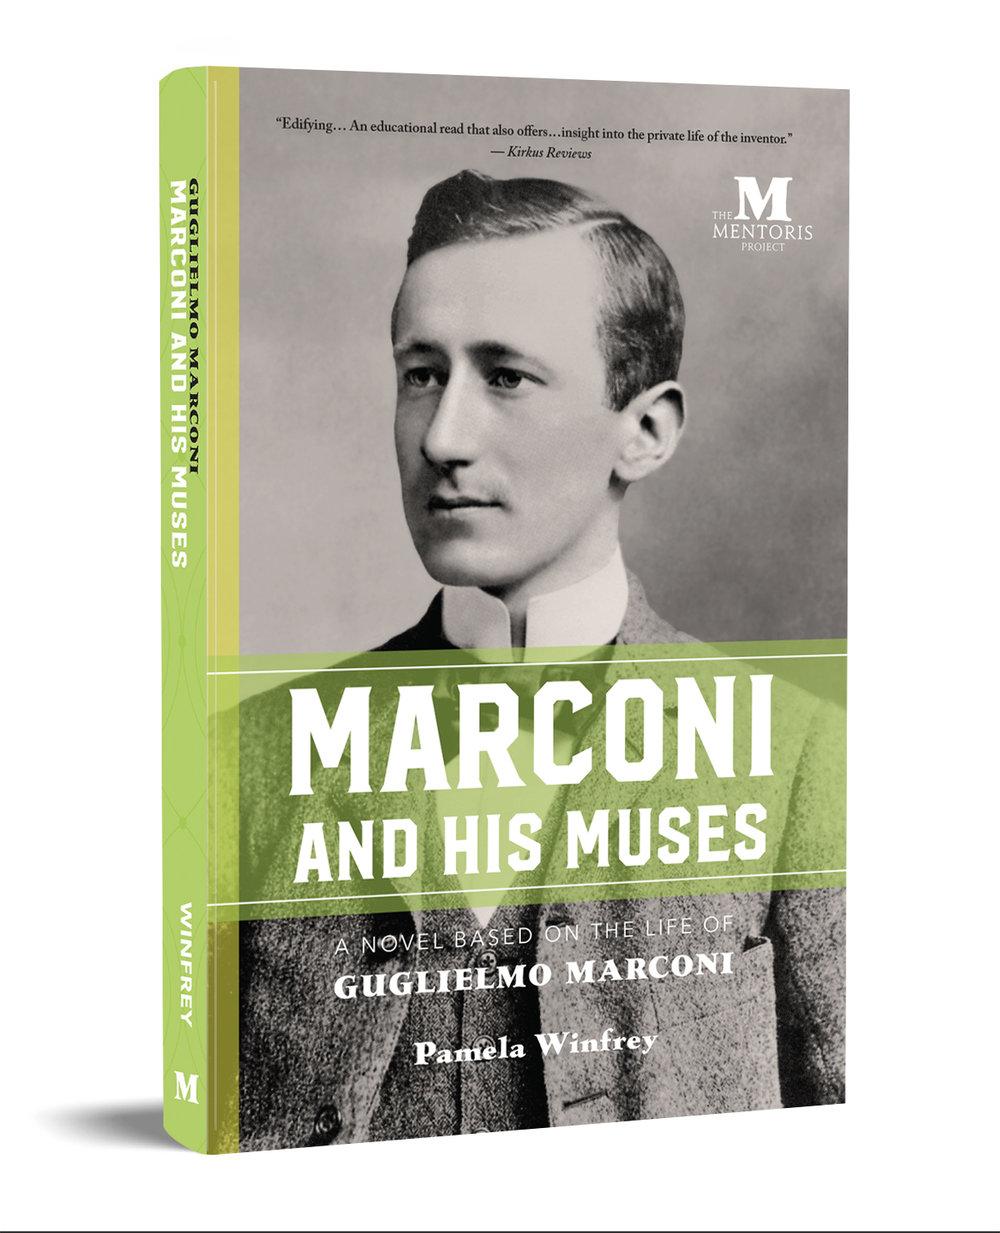 Marconi-Icon-3-28.jpg